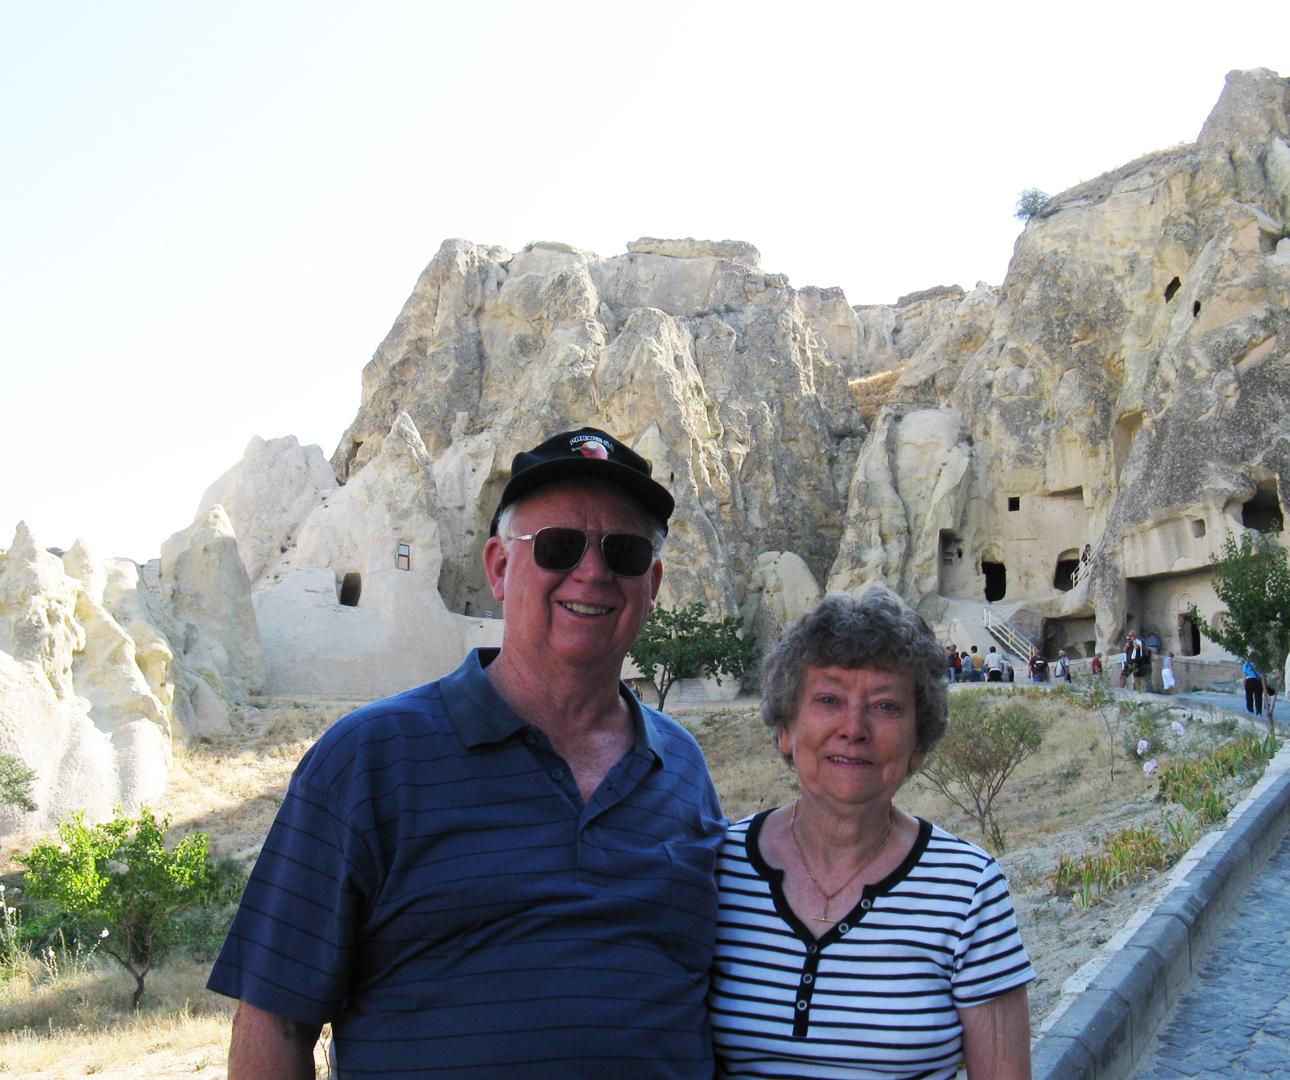 1074-2008-Sandra-_-Geoff,-Goreme-Open-Air-Museum---Cappadocia,-Turkey-11.9